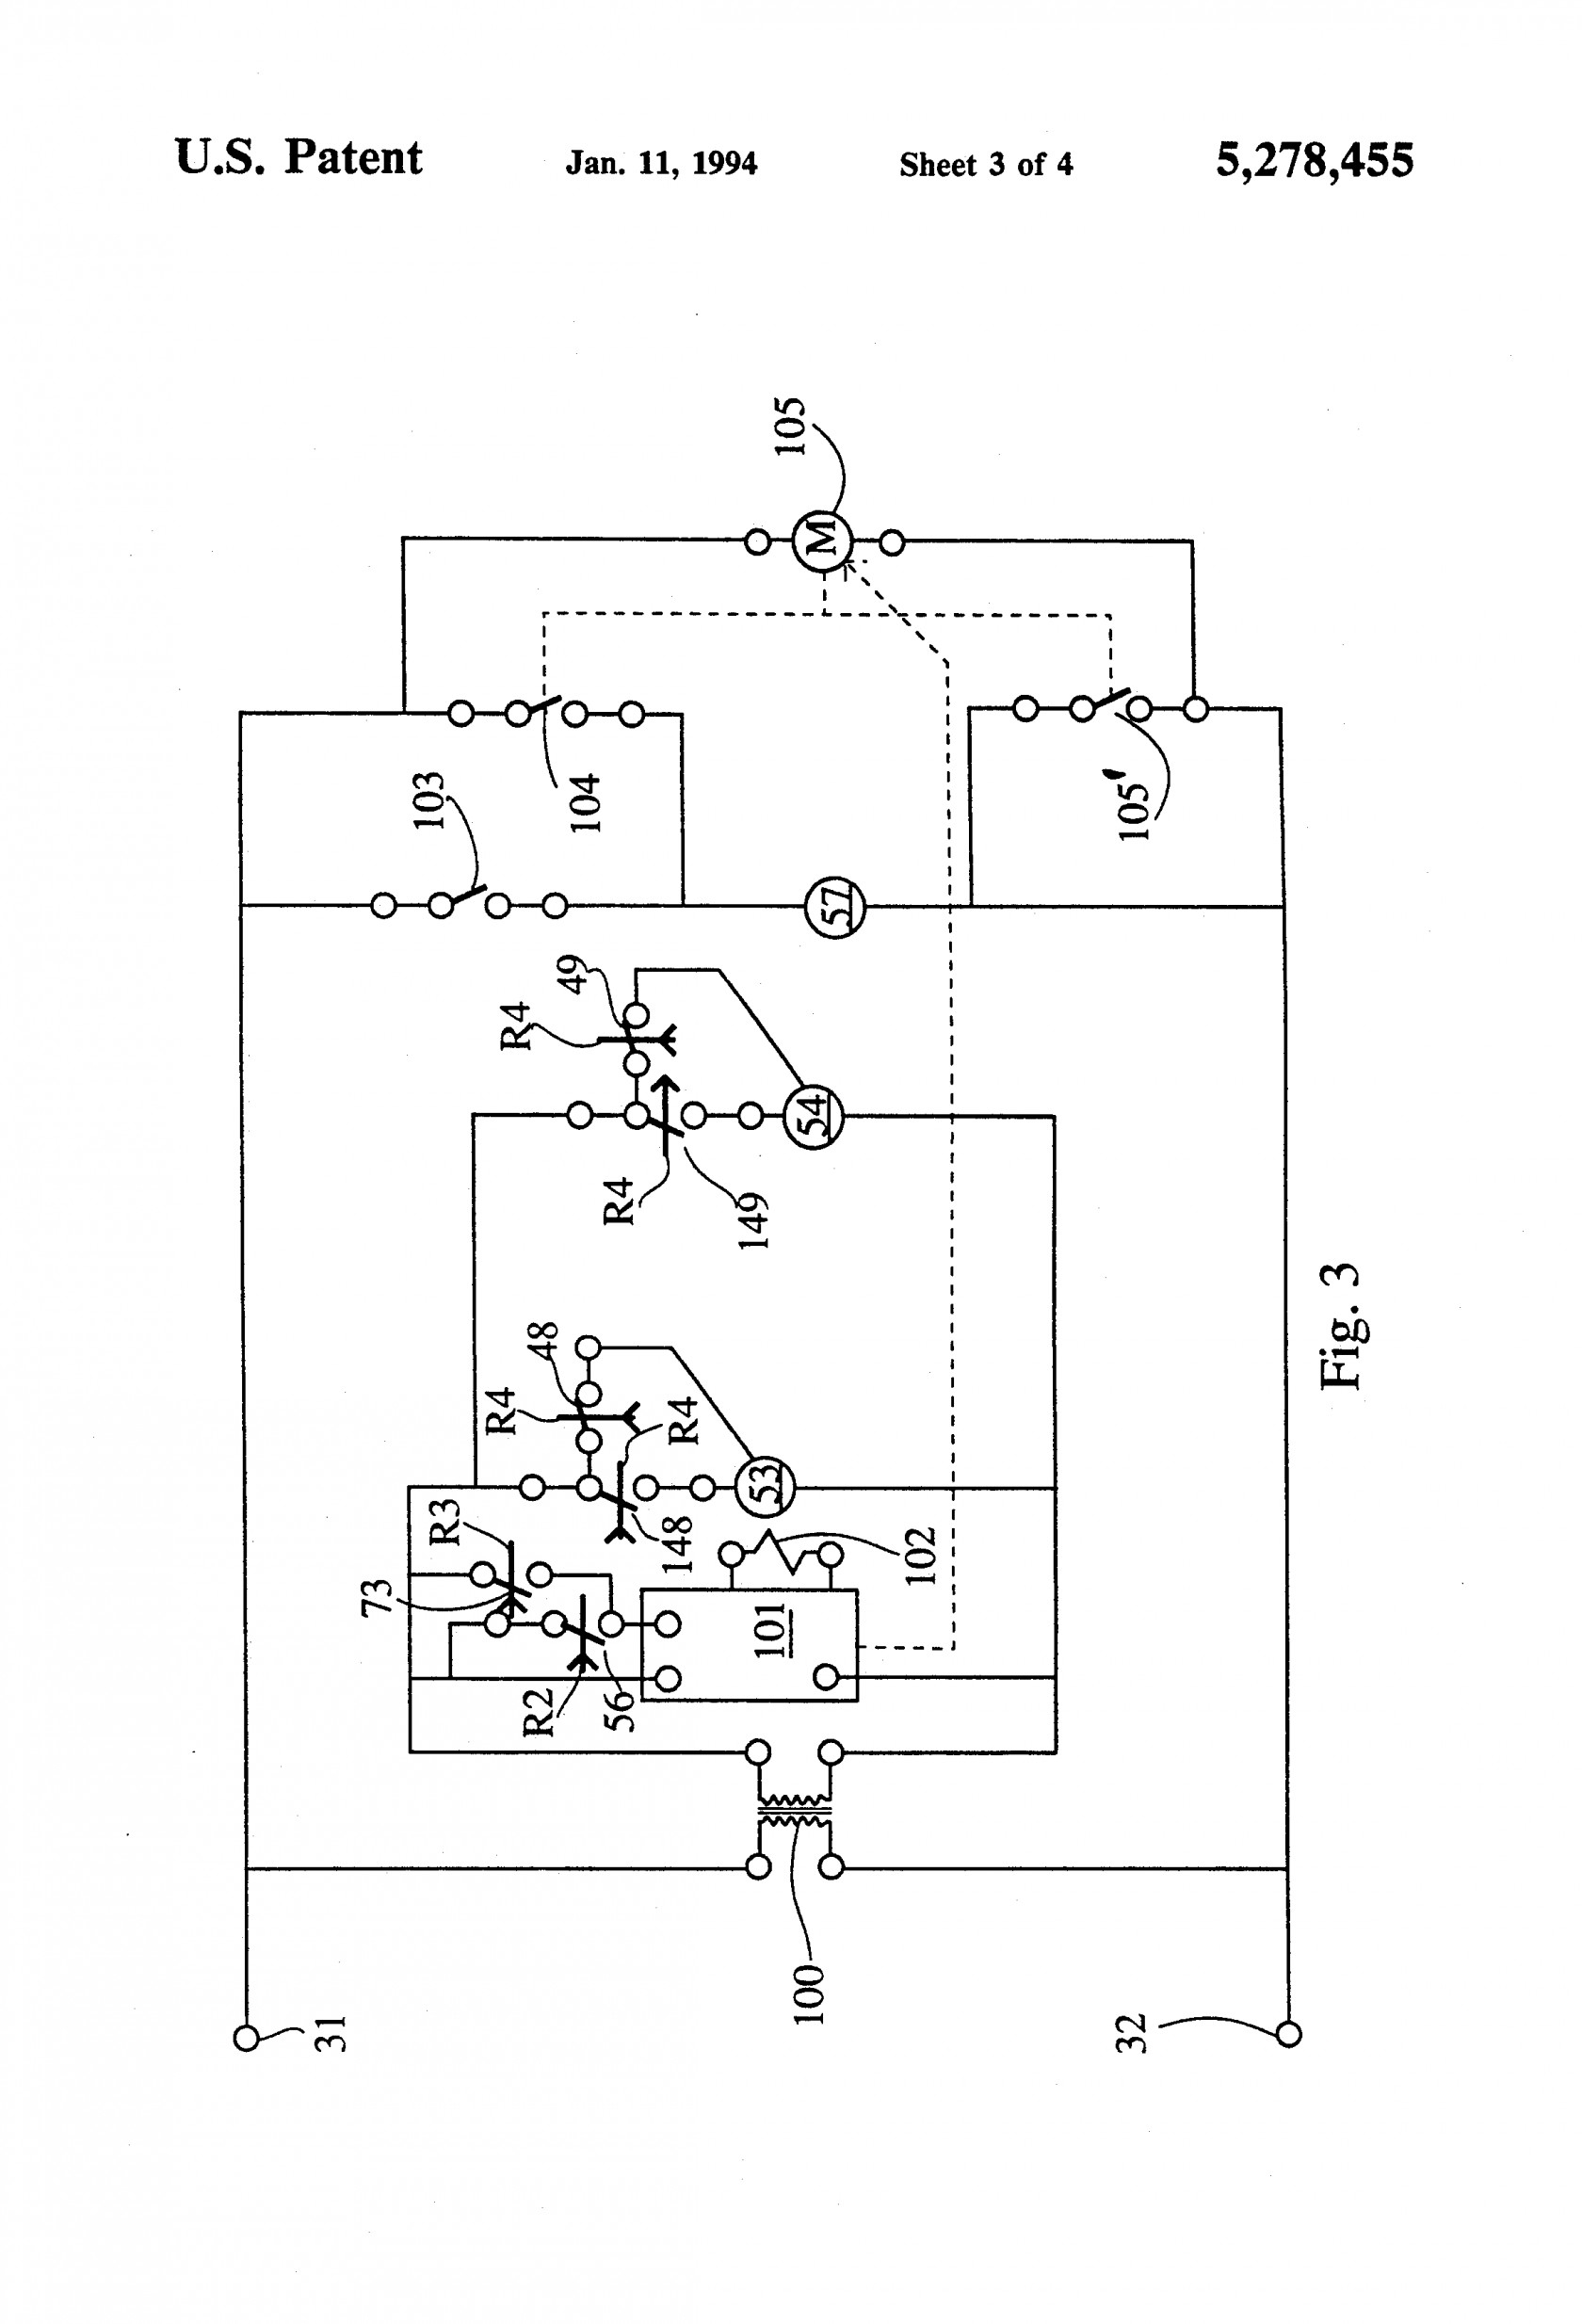 Hayward Super Pump 1 5 Hp Wiring Diagram - List of Wiring ... on